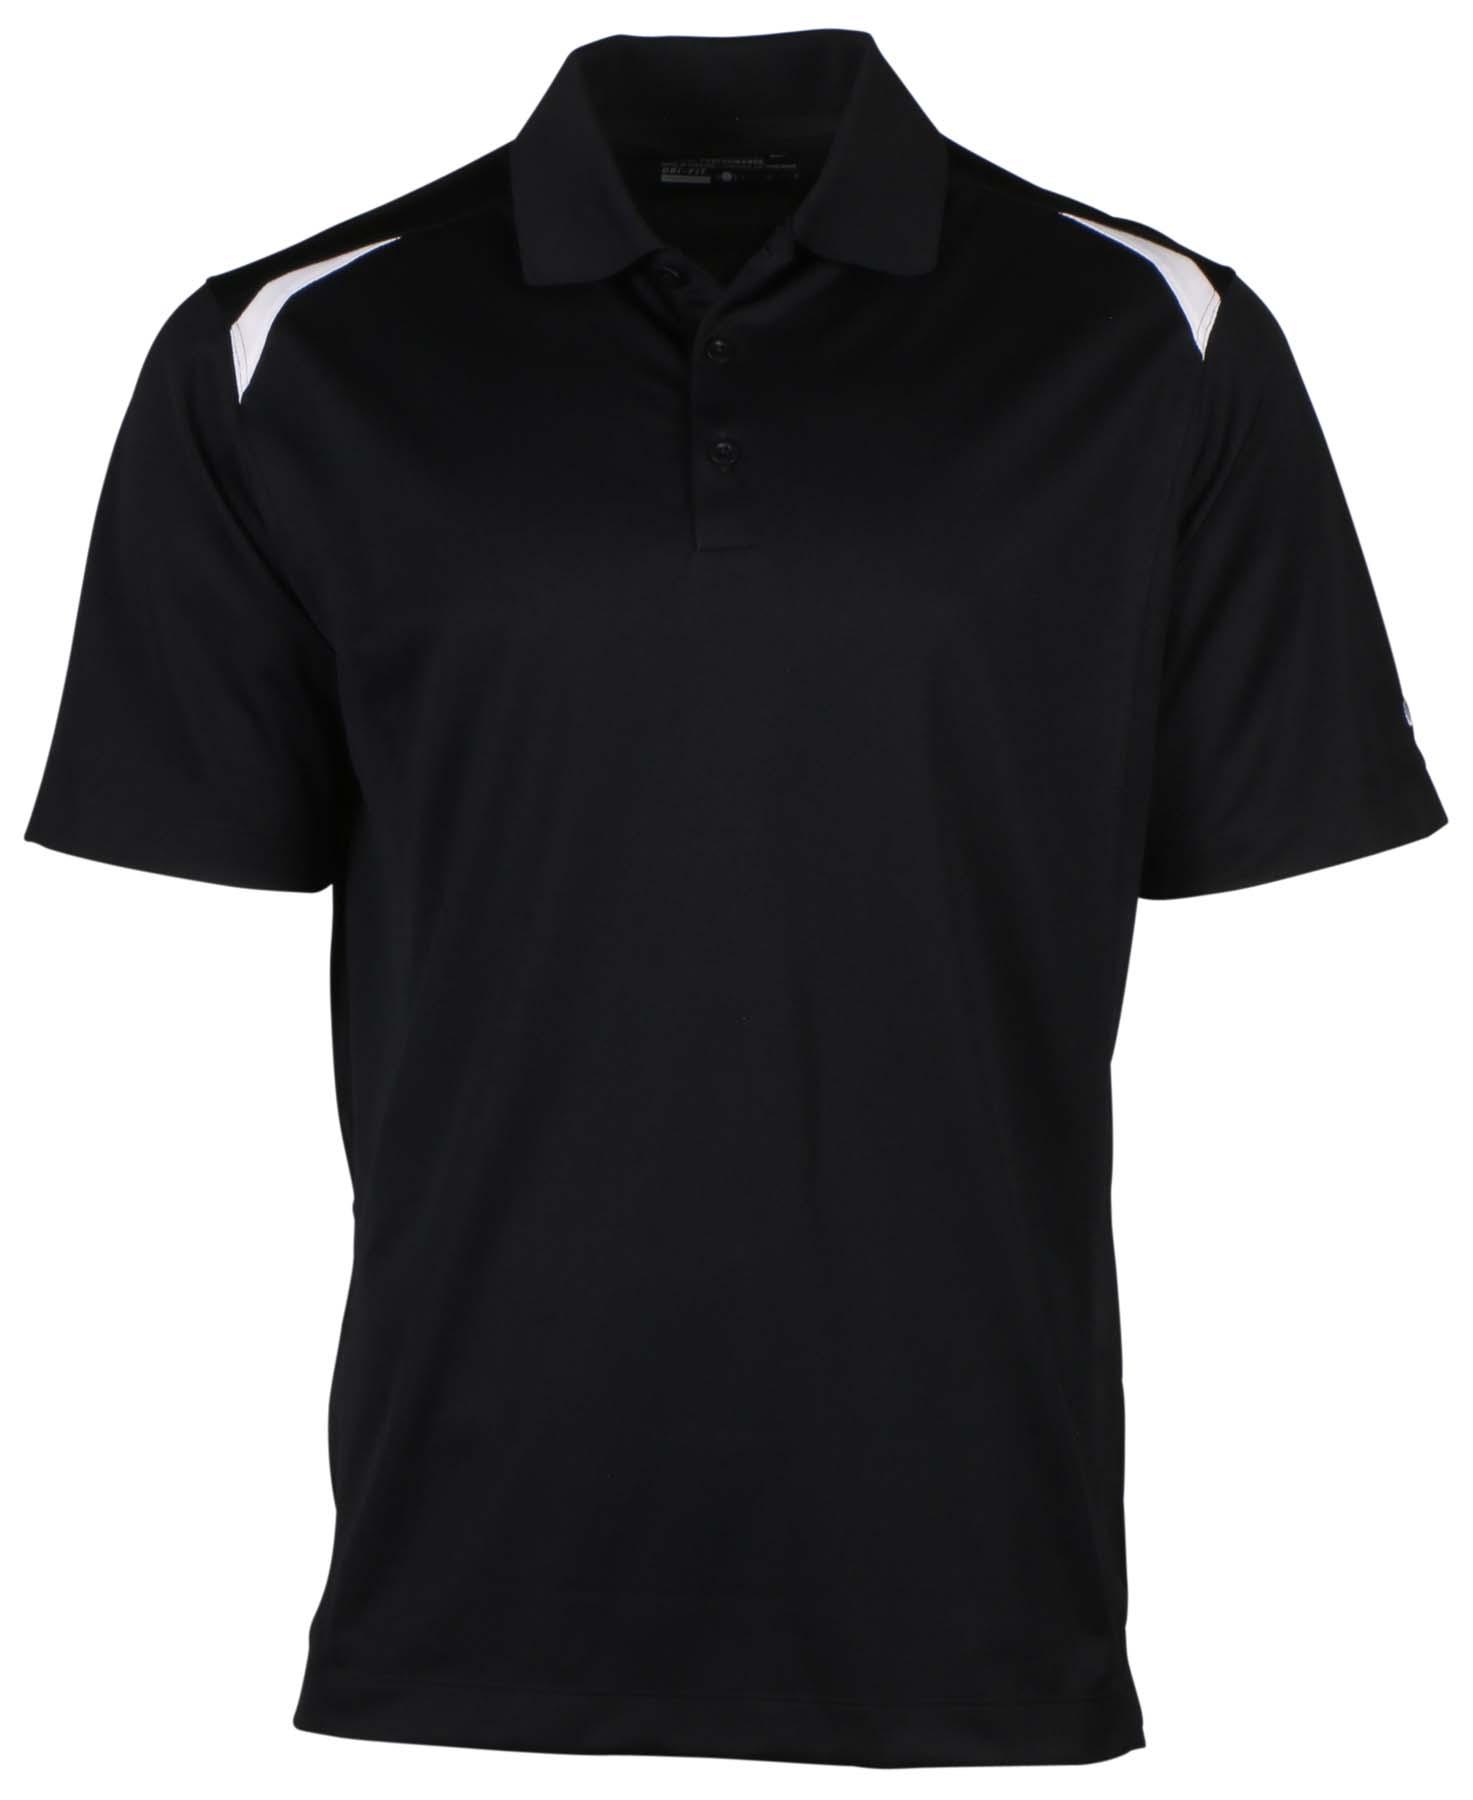 Nike men 39 s dri fit tour performance golf polo shirt ebay for Nike golf mens polo shirts